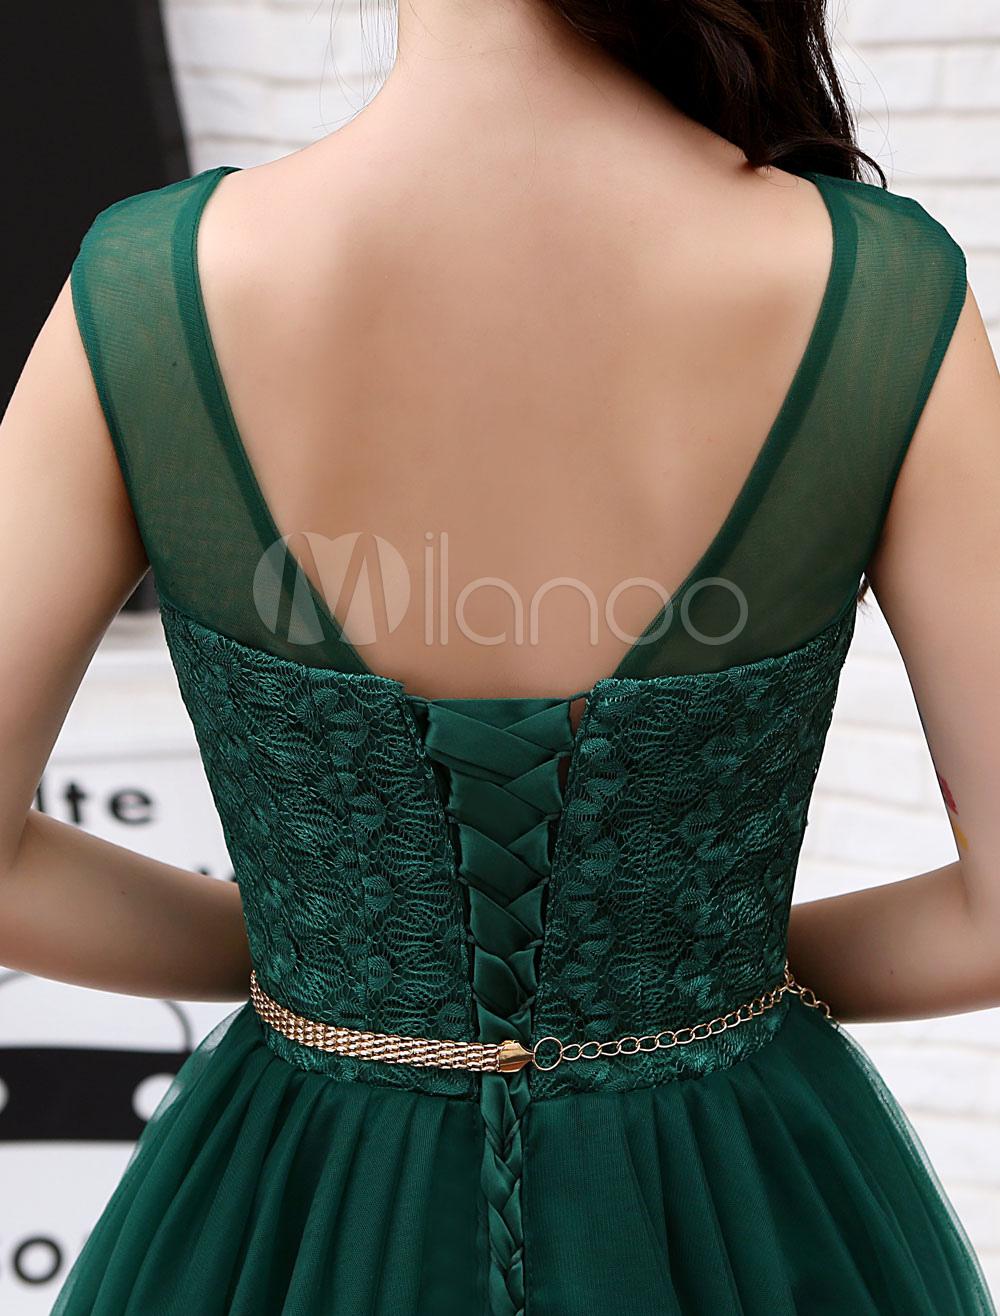 864c49860a ... Short Homecoming Dresses Tulle Dark Green Illusion Sash Mini Cocktail  Dresses-No.8